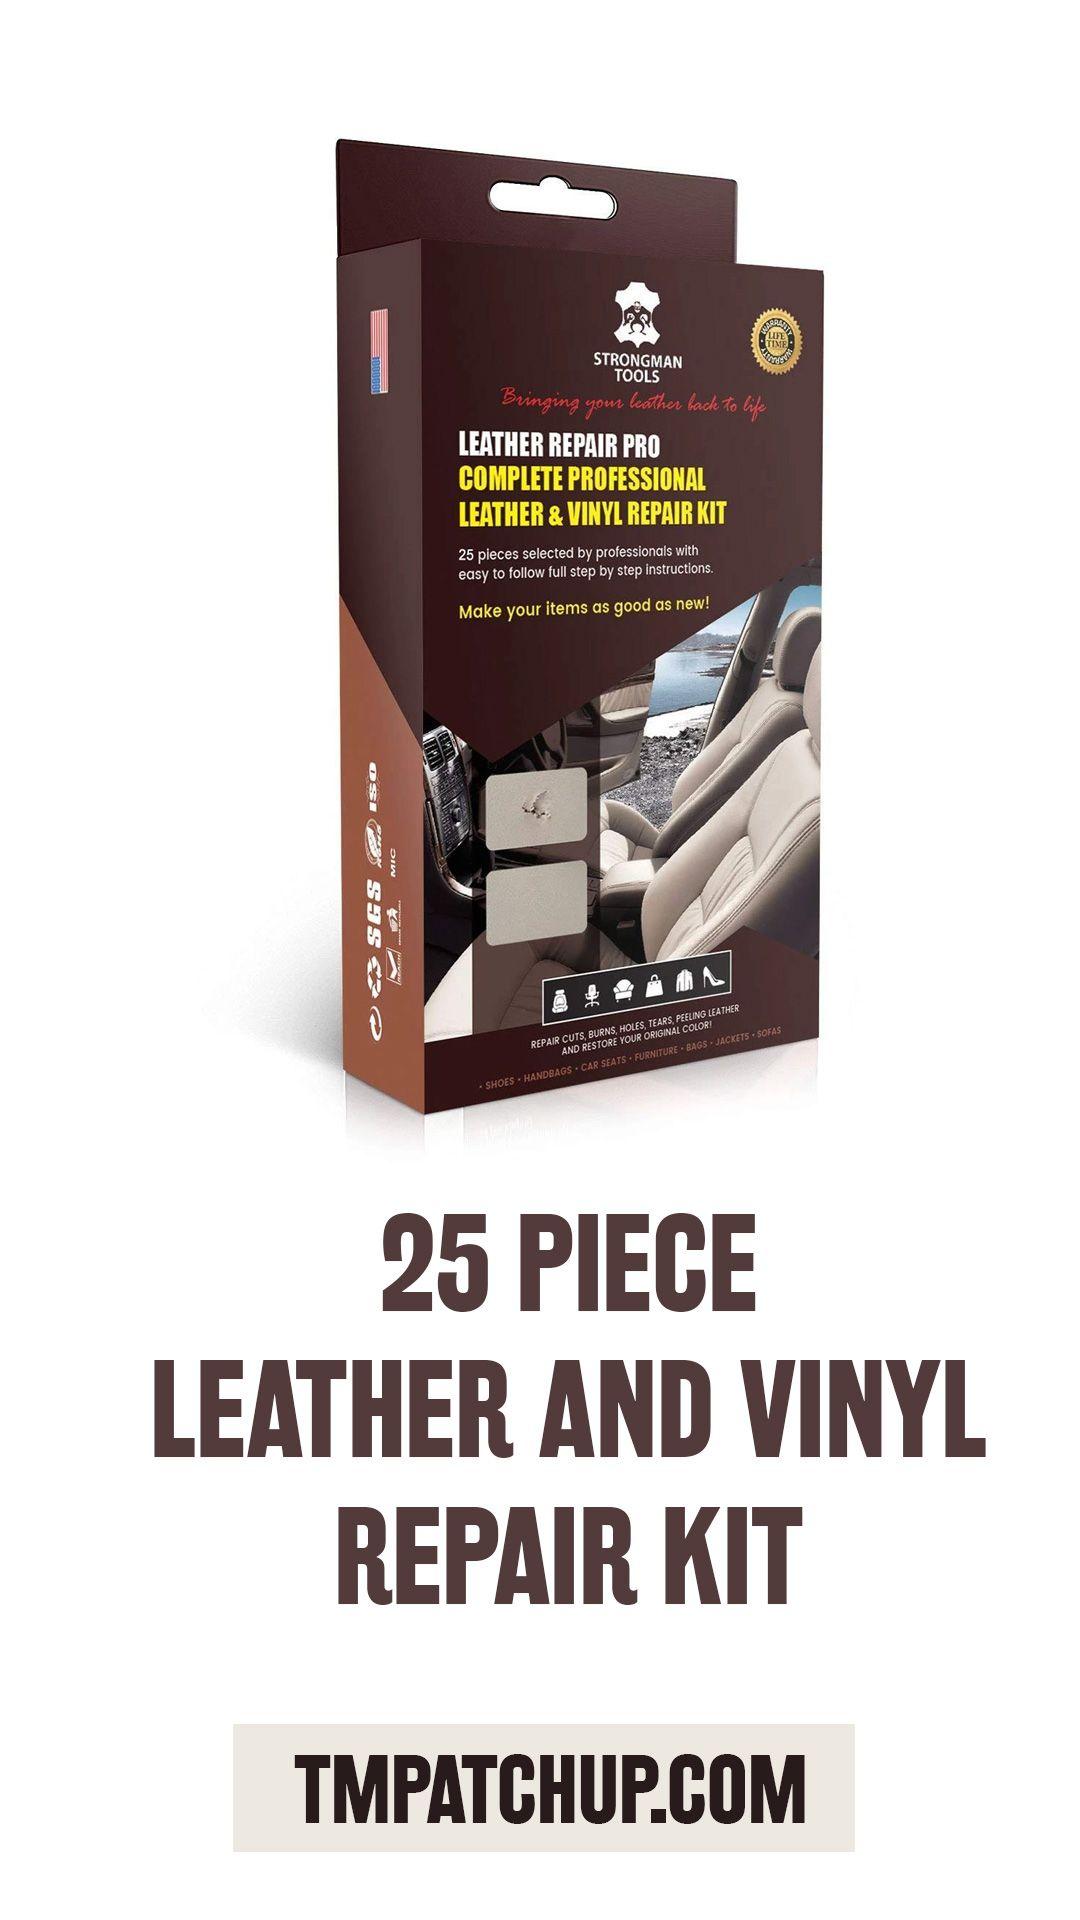 Professional Leather Repair : professional, leather, repair, STRONGMAN, Tools, Piece, Professional, Leather, Vinyl, Repair, Heat,, Drying,, Simple, Instructions,, Match, Color,, Seats,, Sofas,, Bags,…, Repair,, Adhesive,